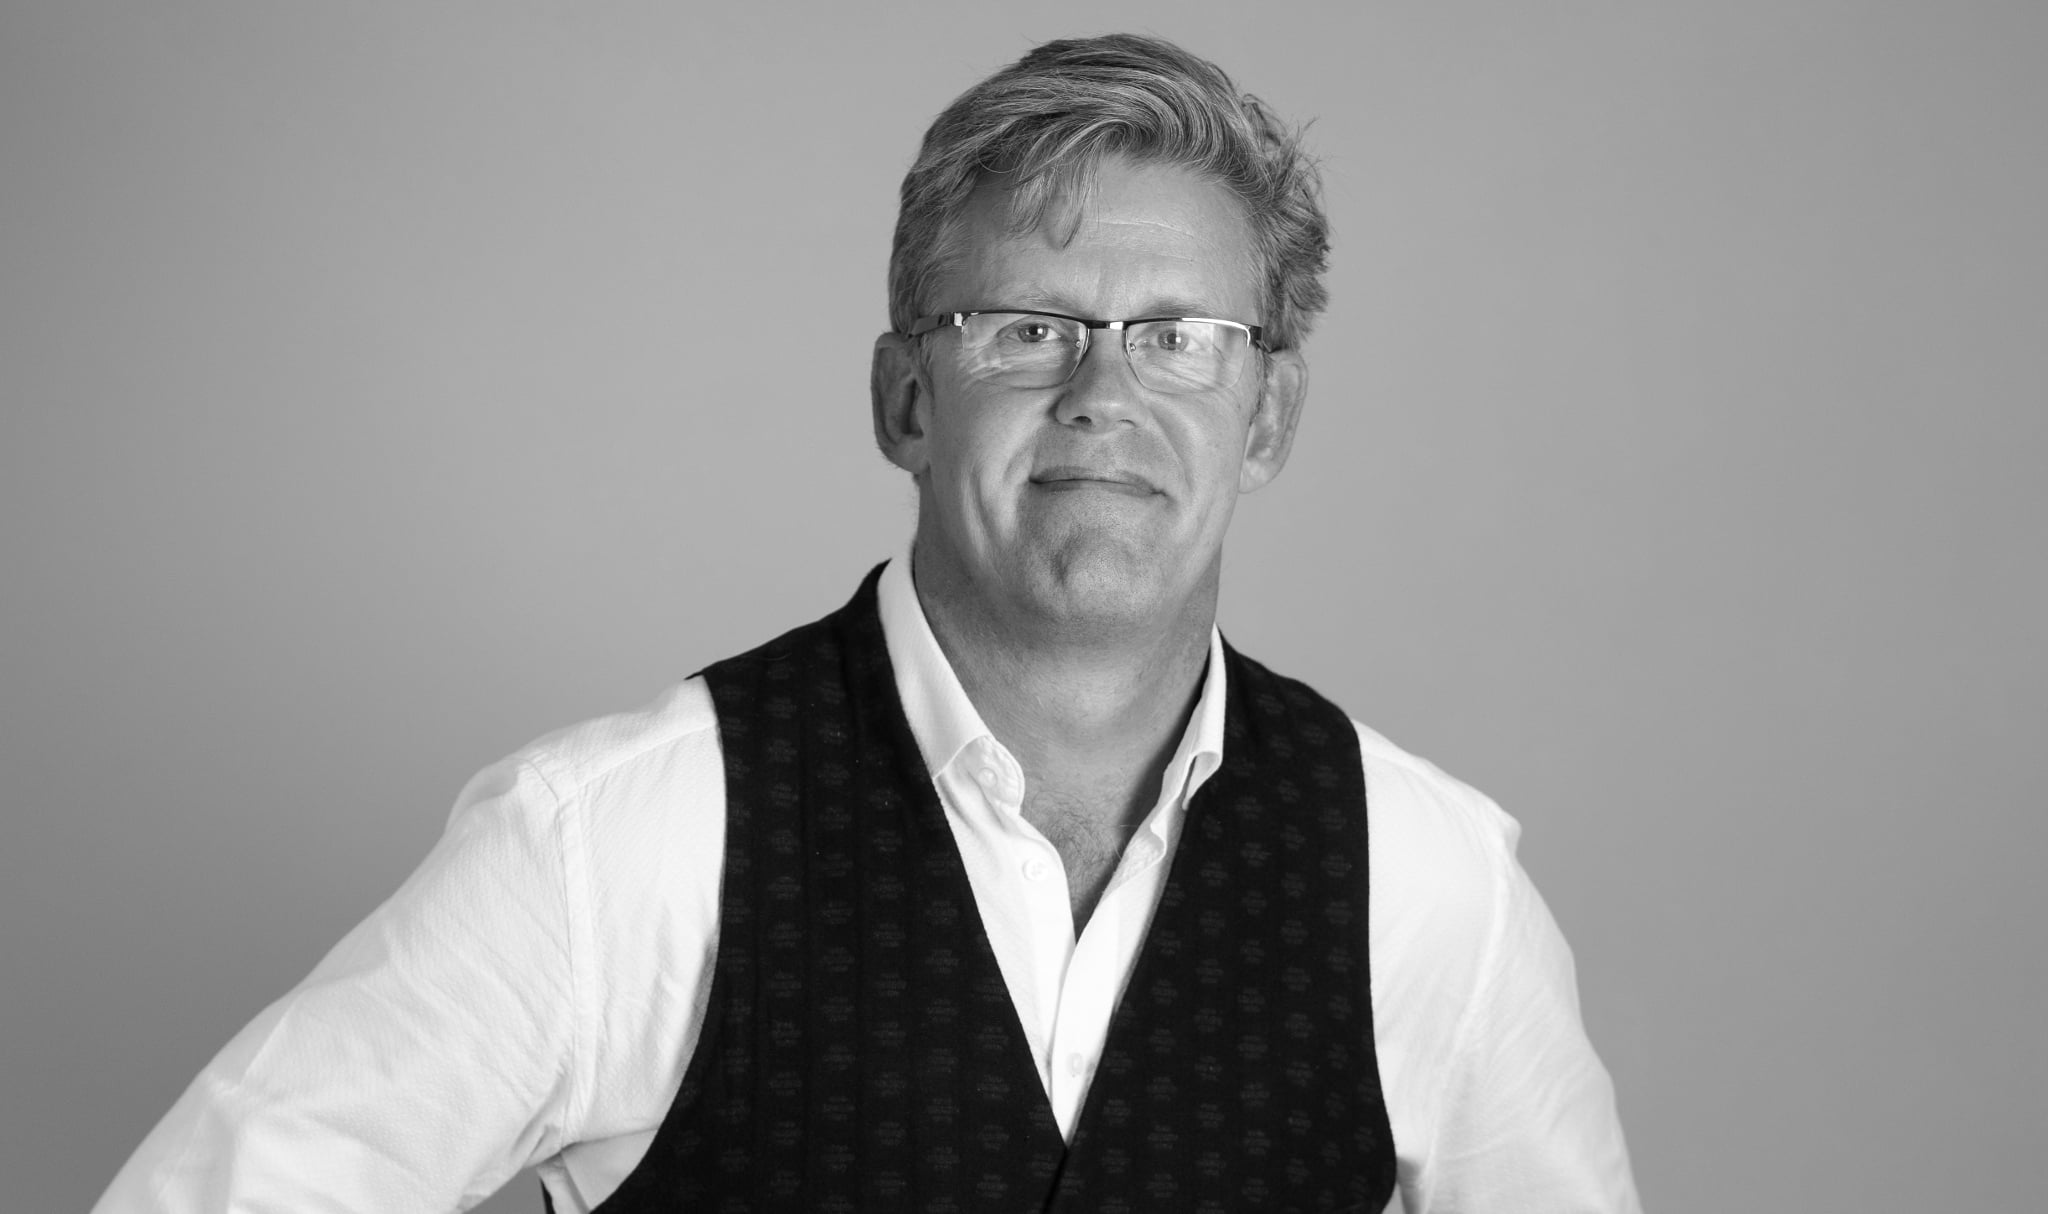 Pepe Nummi, fasilitaattori ja valmentaja, Grape Peoplen perustaja